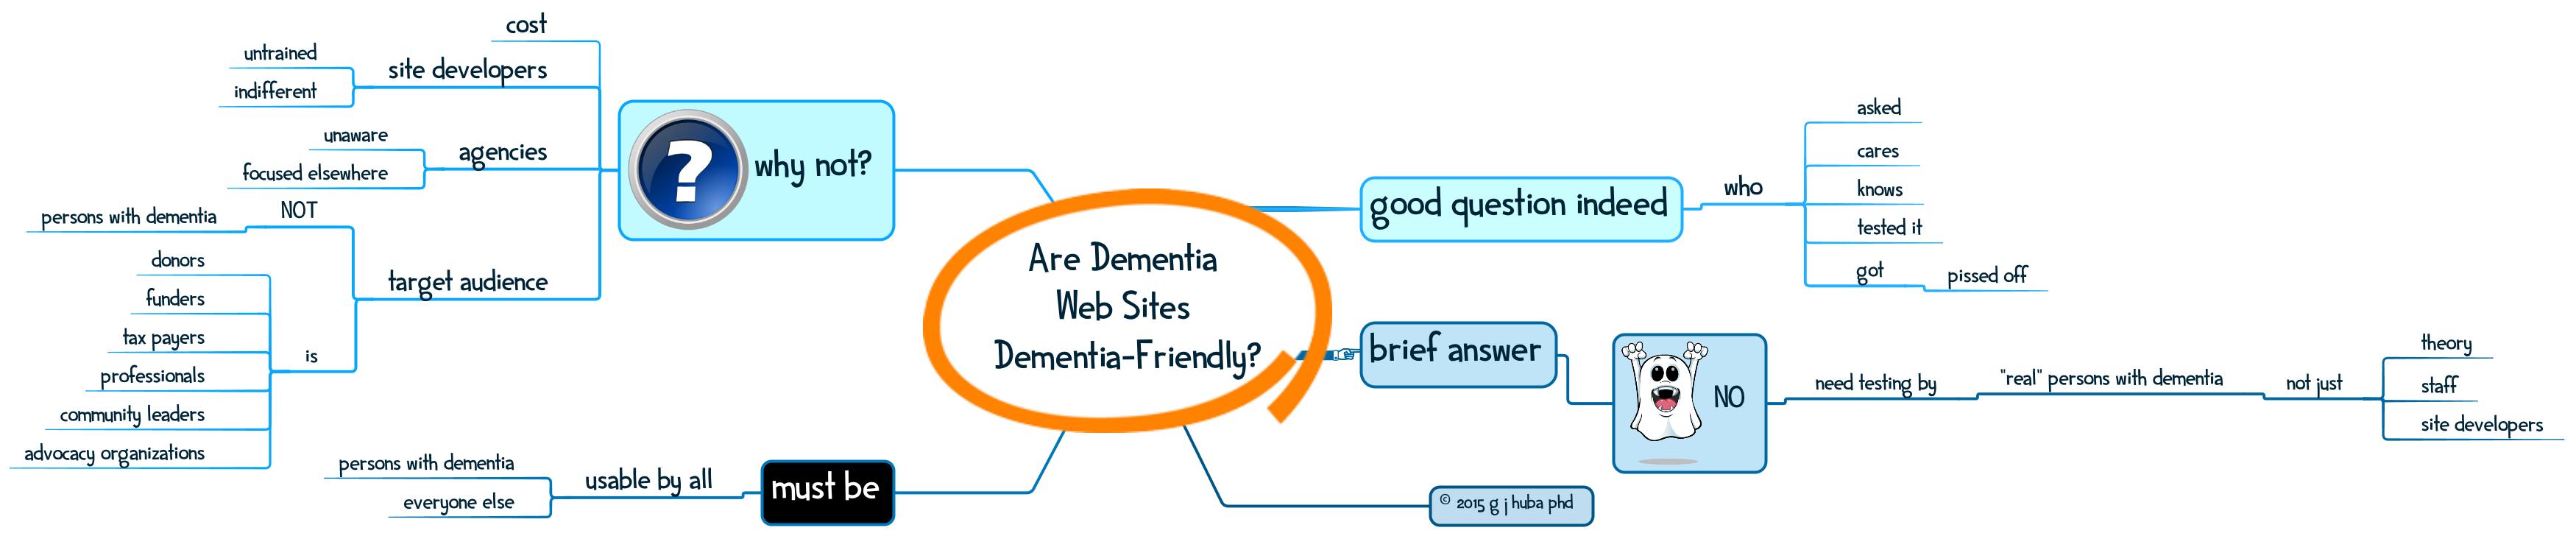 2Are Dementia Web Sites Dementia-Friendly